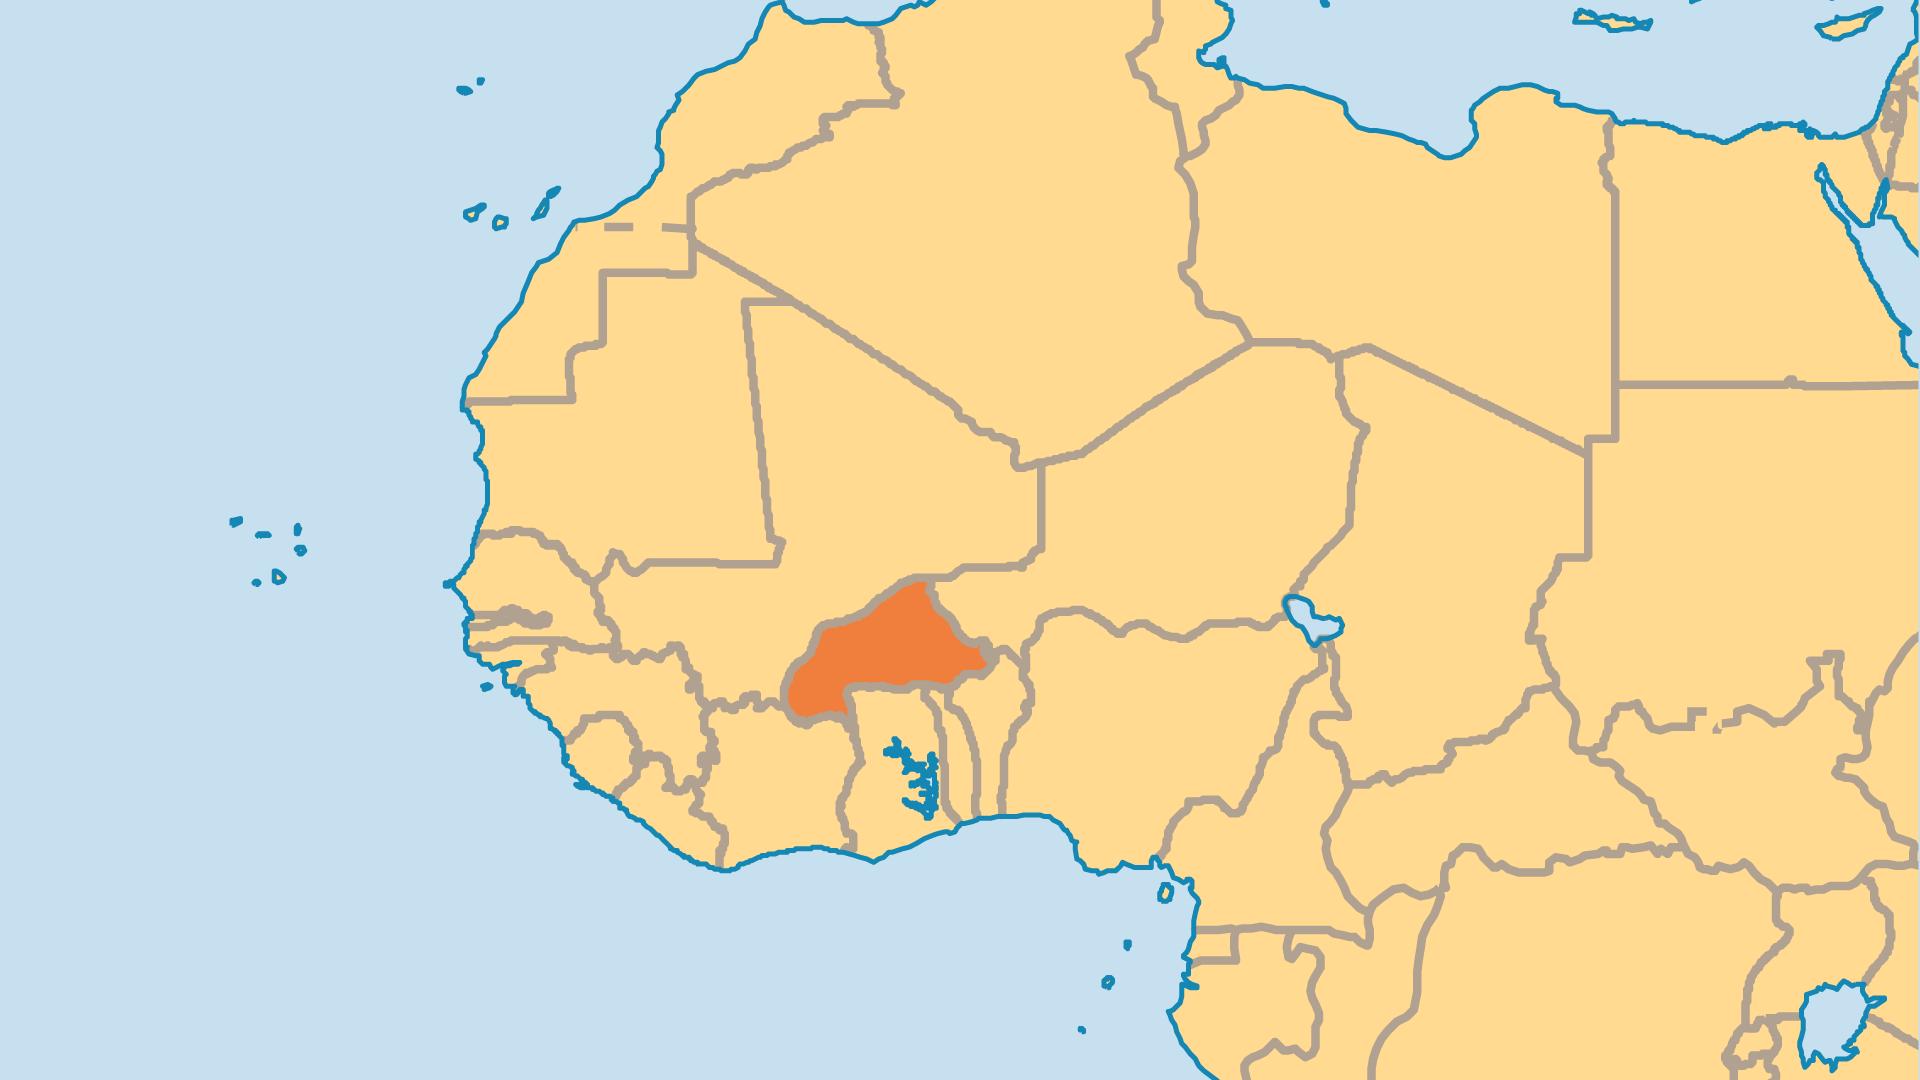 Locator Map for Burkina Faso